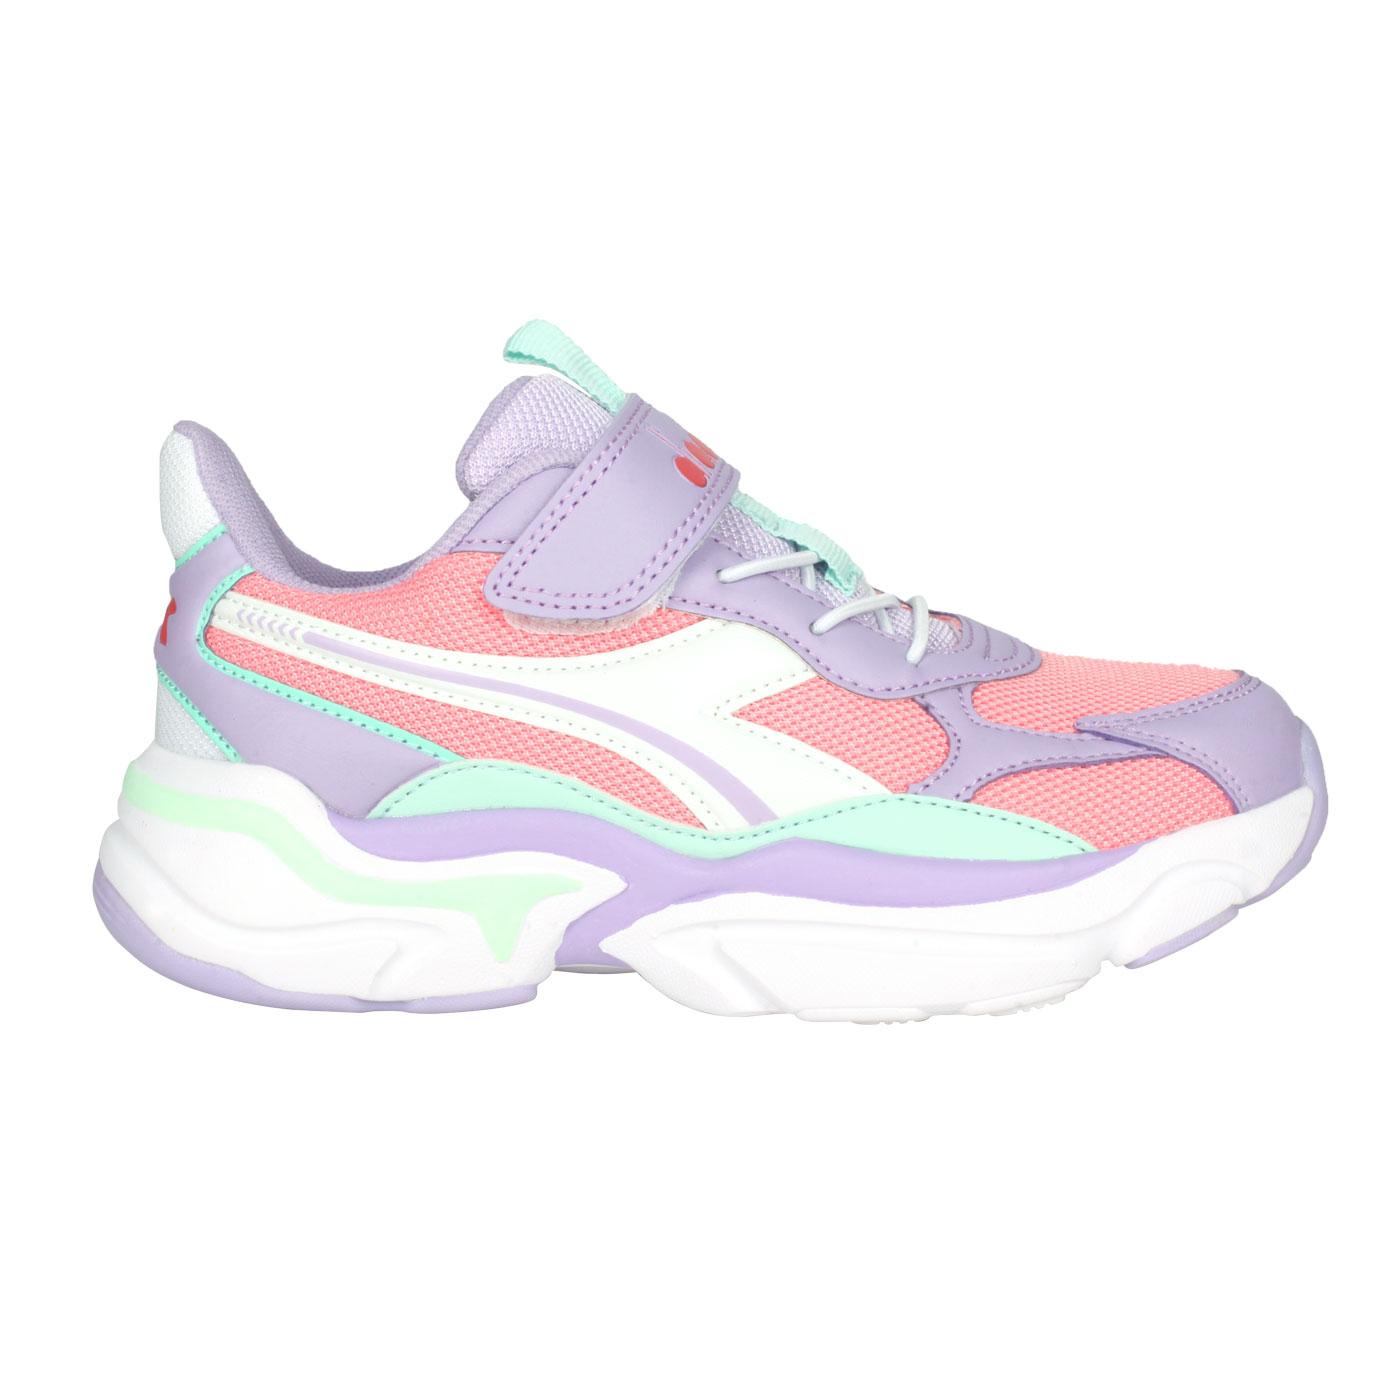 DIADORA 中童運動生活時尚鞋-超寬楦 DA13055 - 紫粉綠白